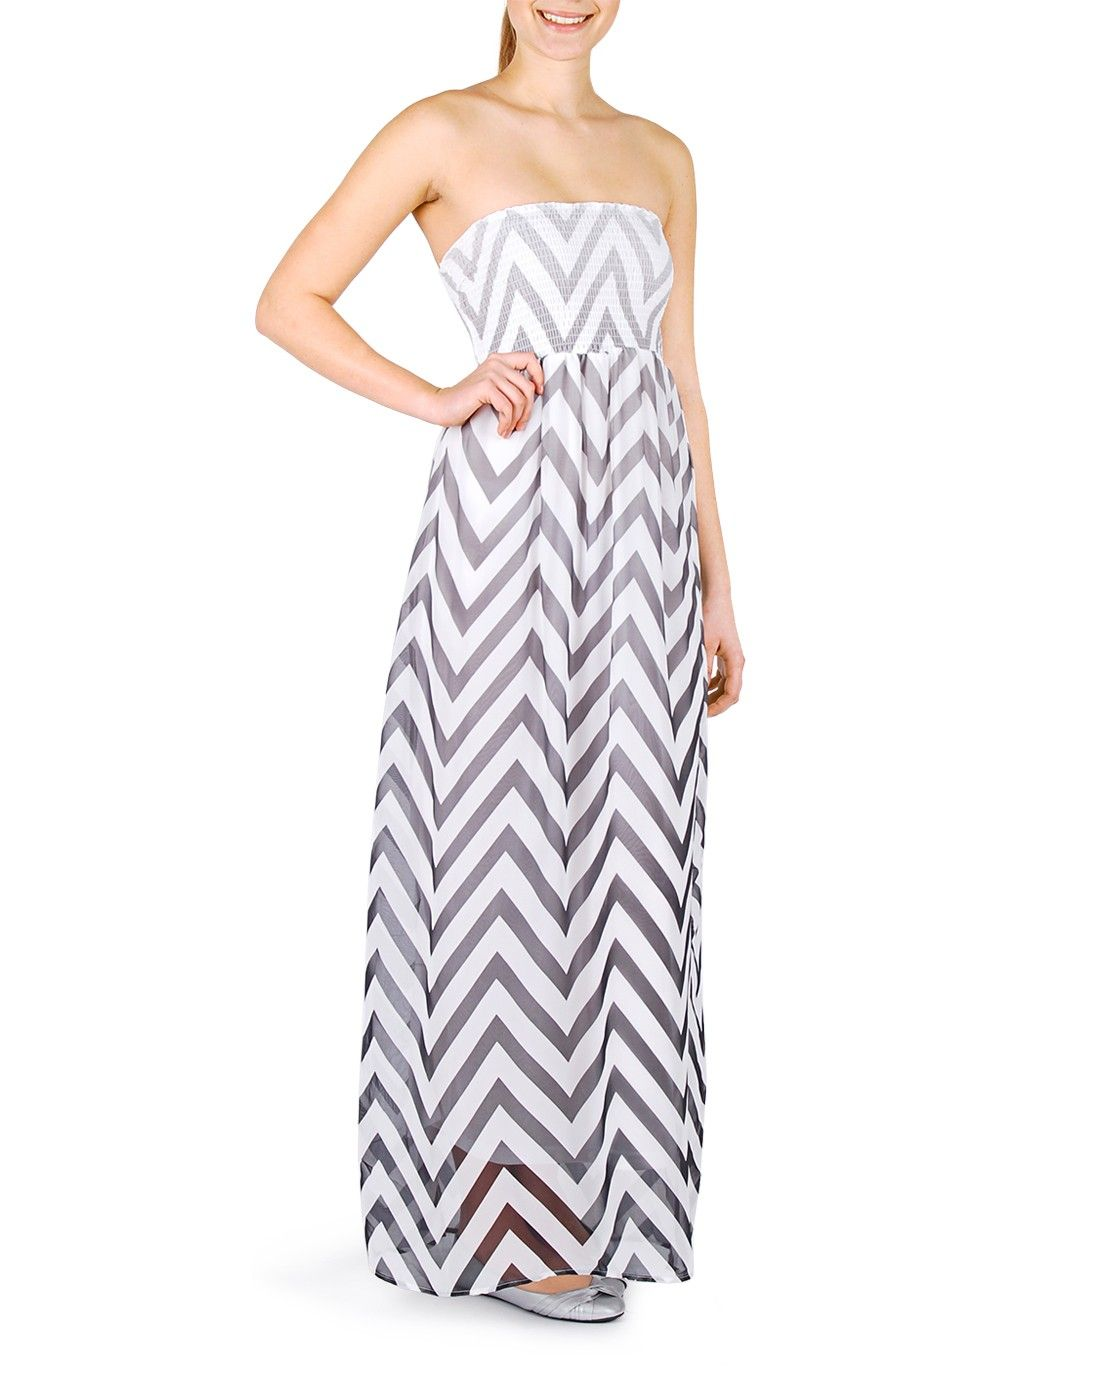 Ardene dresses | Virtual Wardrobe | Dresses, Ombre maxi ...